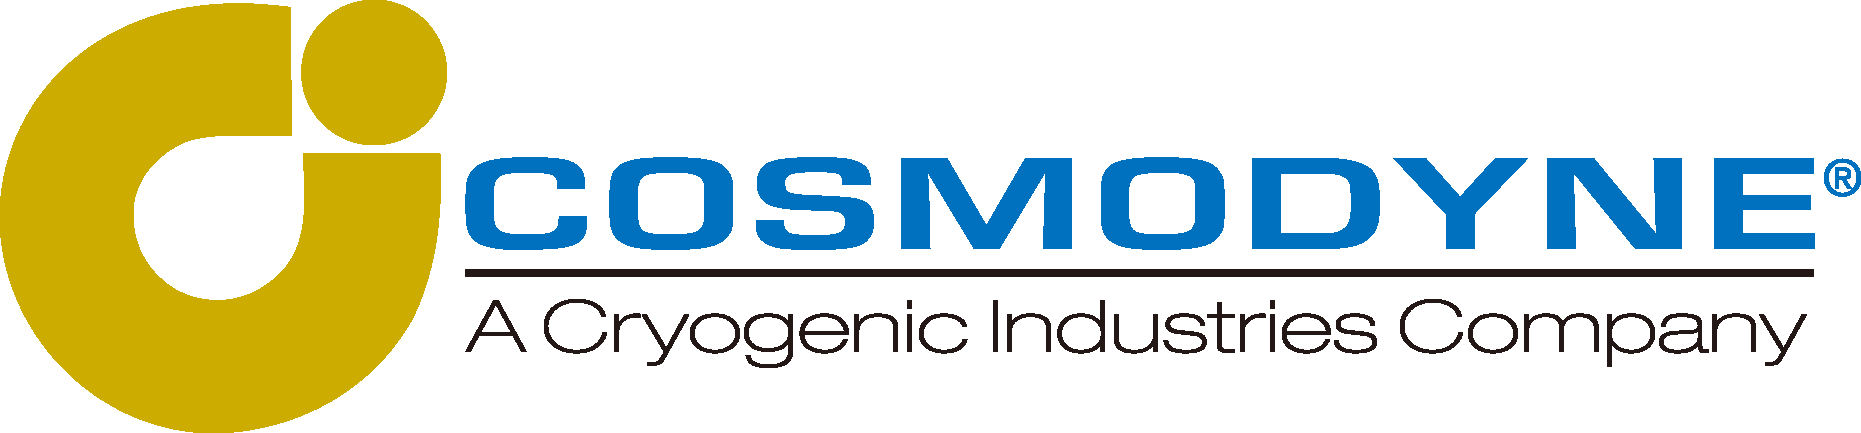 Cosmodyne_logo_背景透過.png